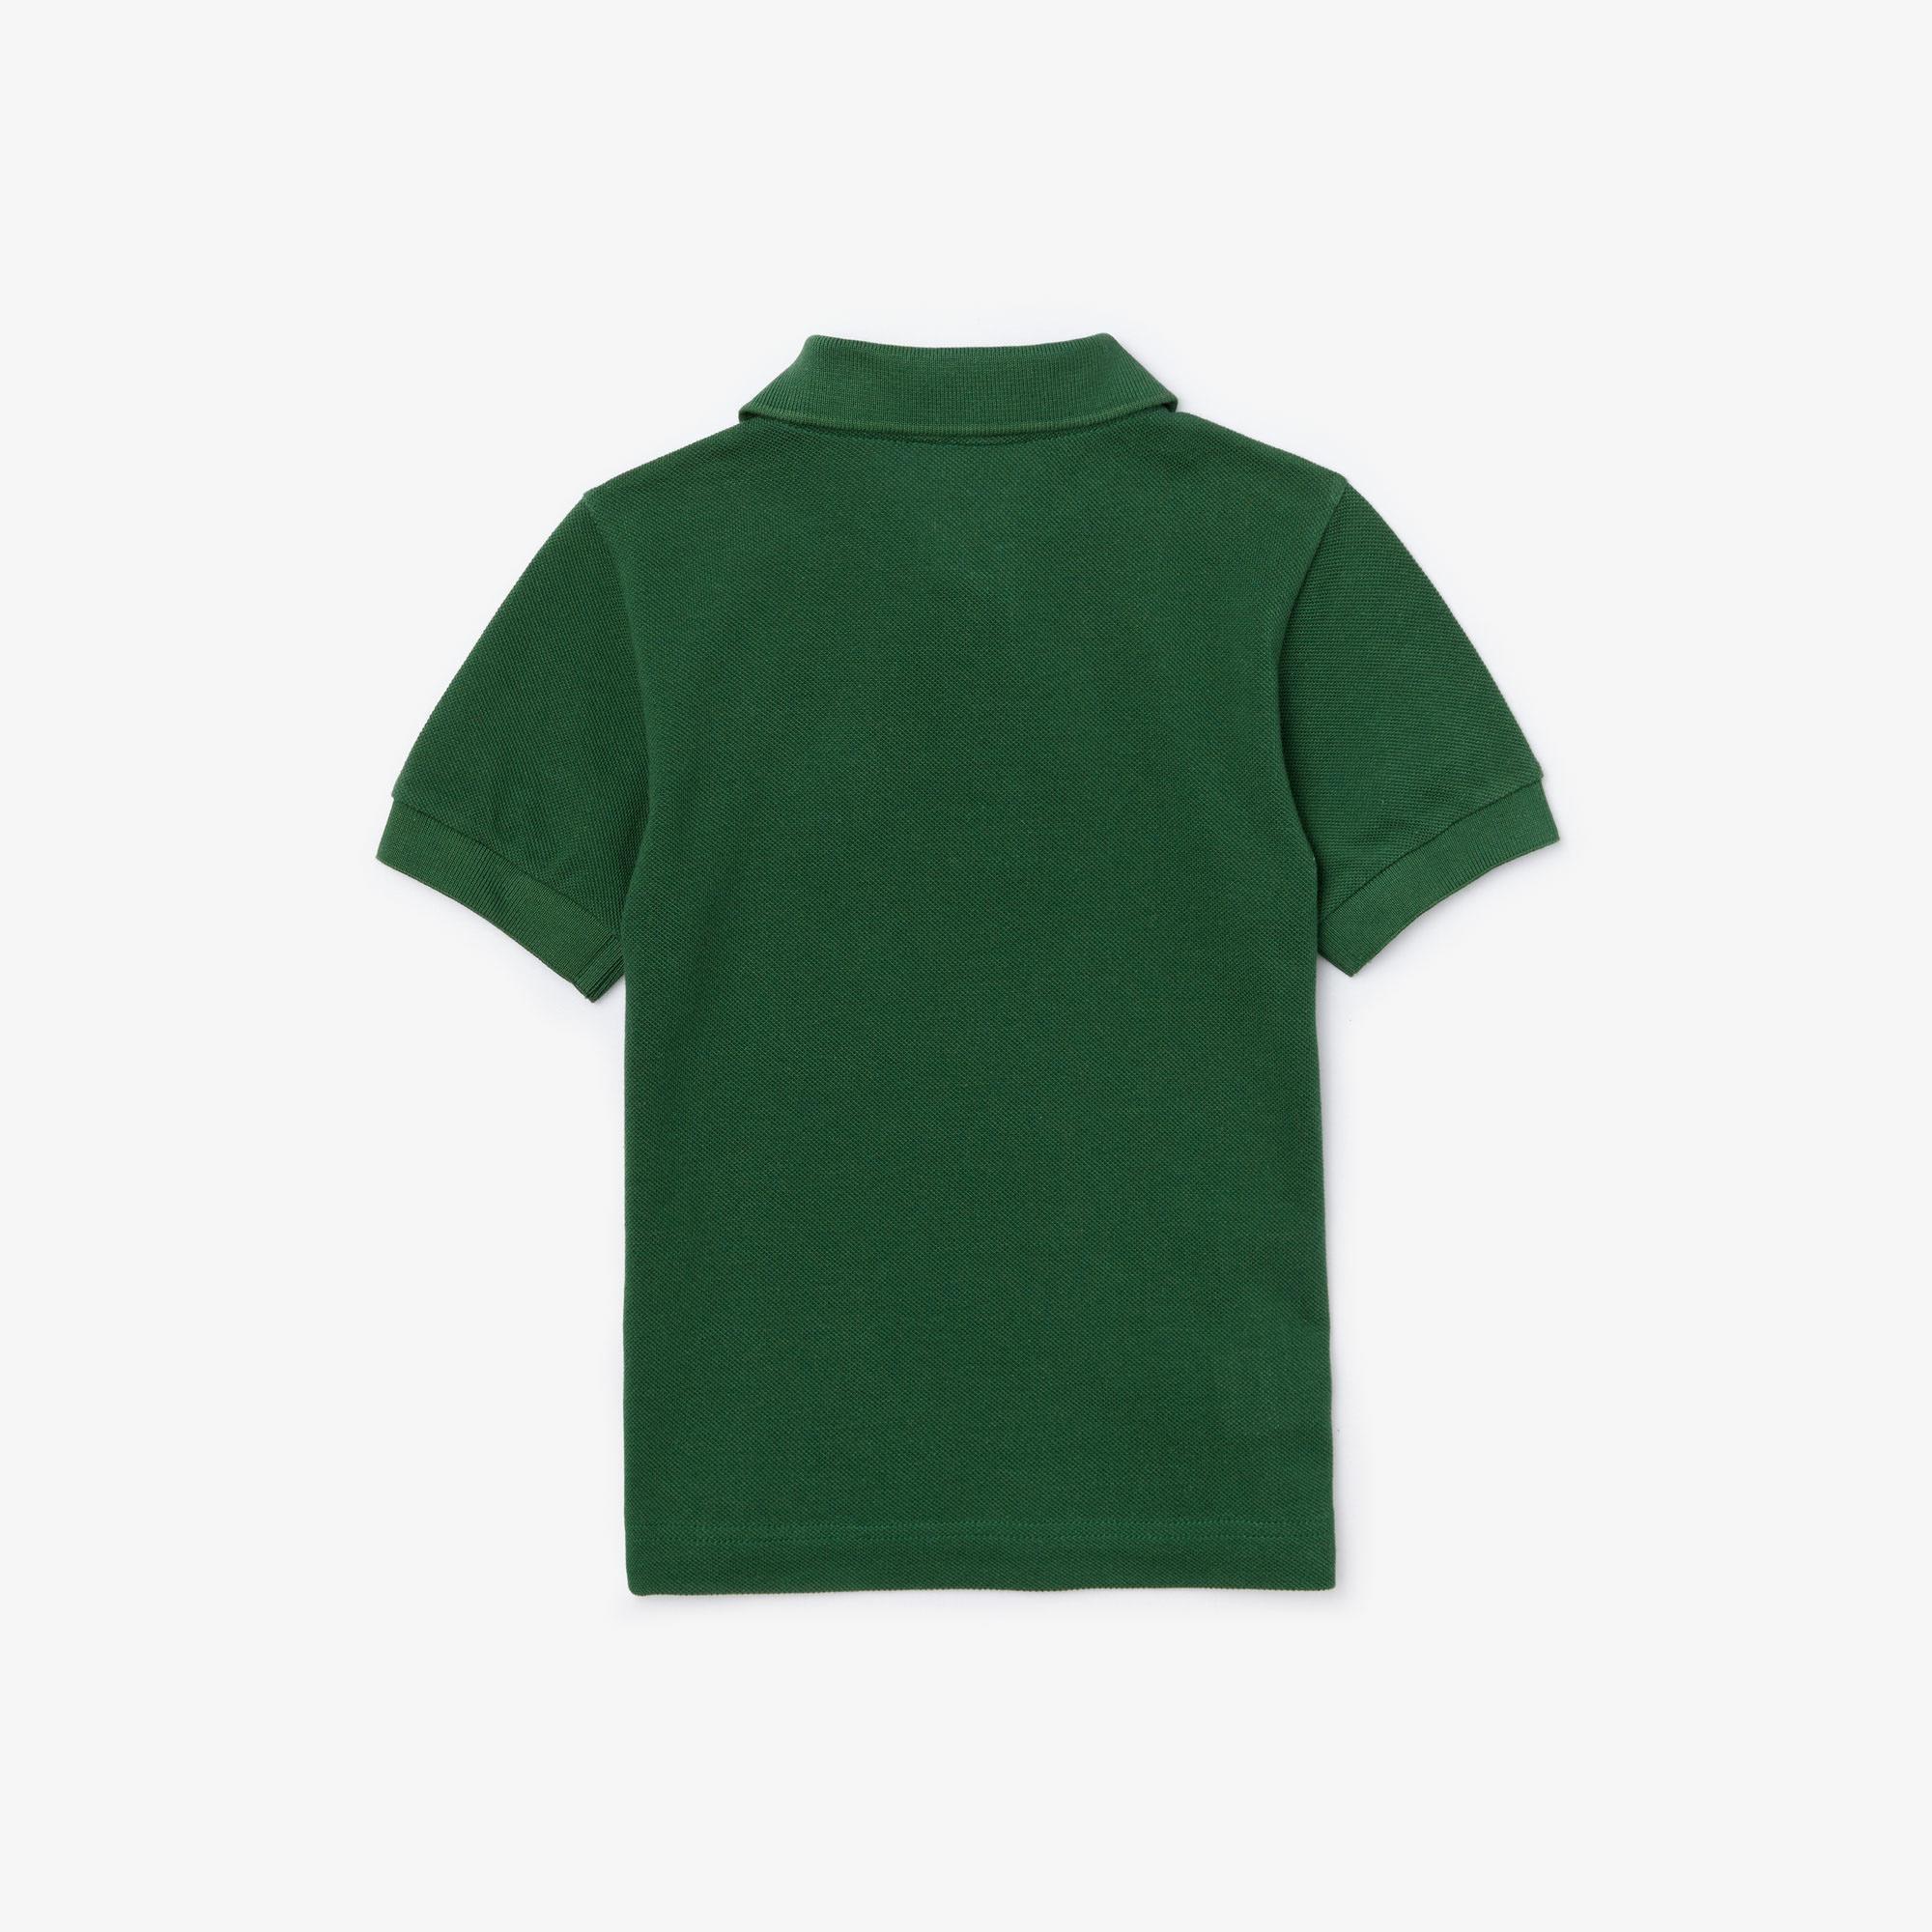 Lacoste Çocuk Desenli Yeşil Polo